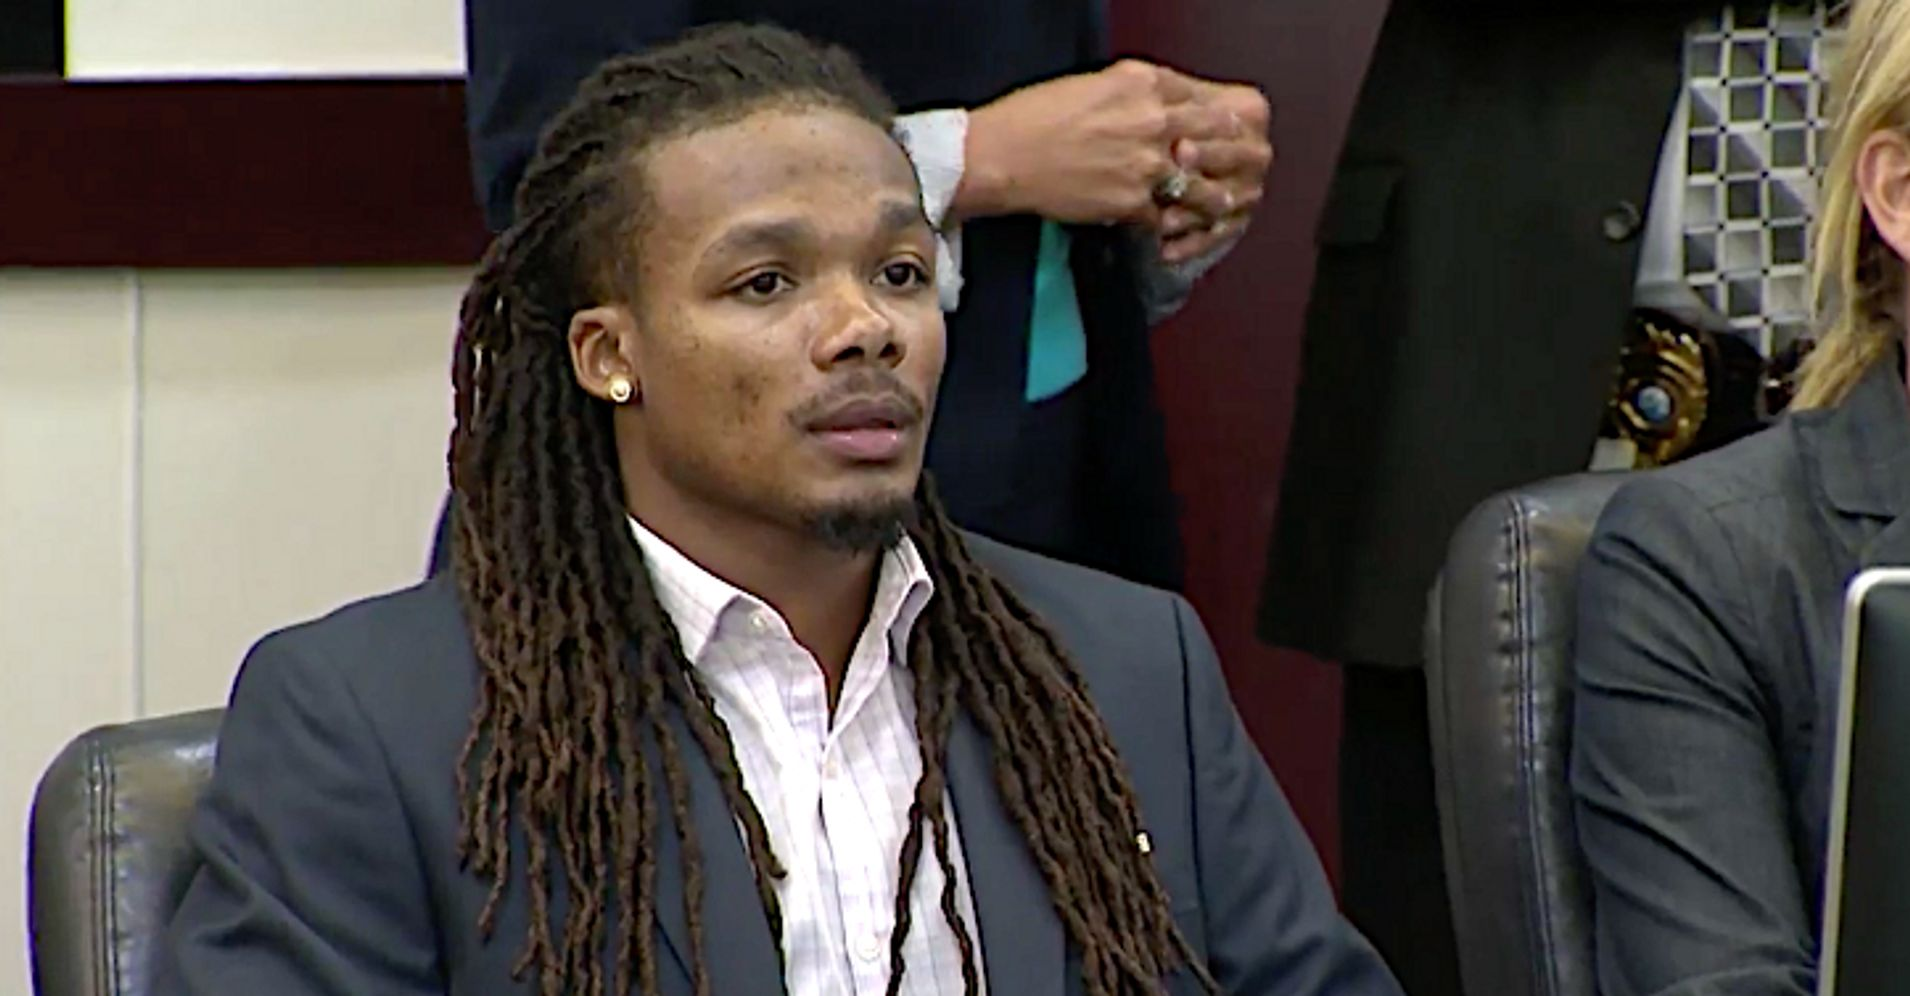 Ex-Vanderbilt Football Player Found Guilty In Gang Rape Of Unconscious Student